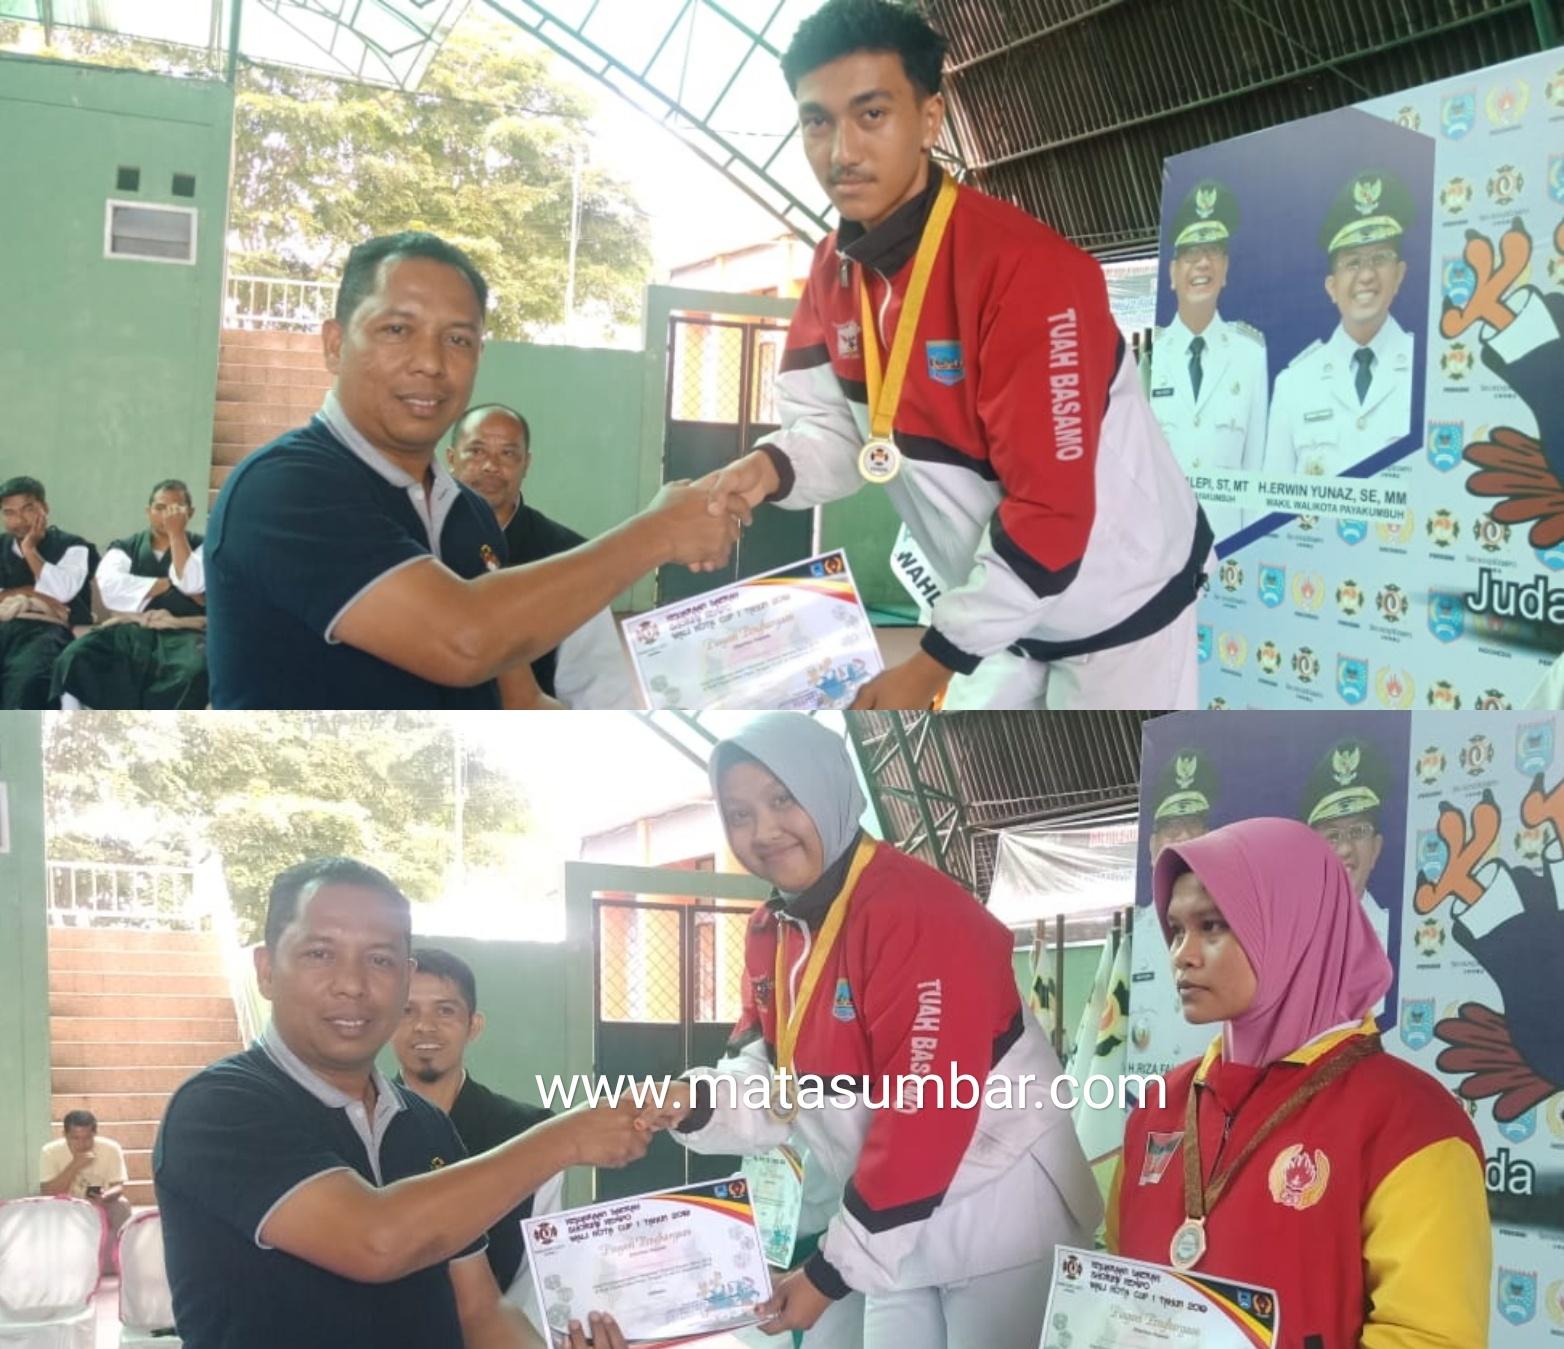 Kejurda Shorinji, Atlet Kempo Pasbar Berhasil Sabet Dua Medali Emas dan Perak